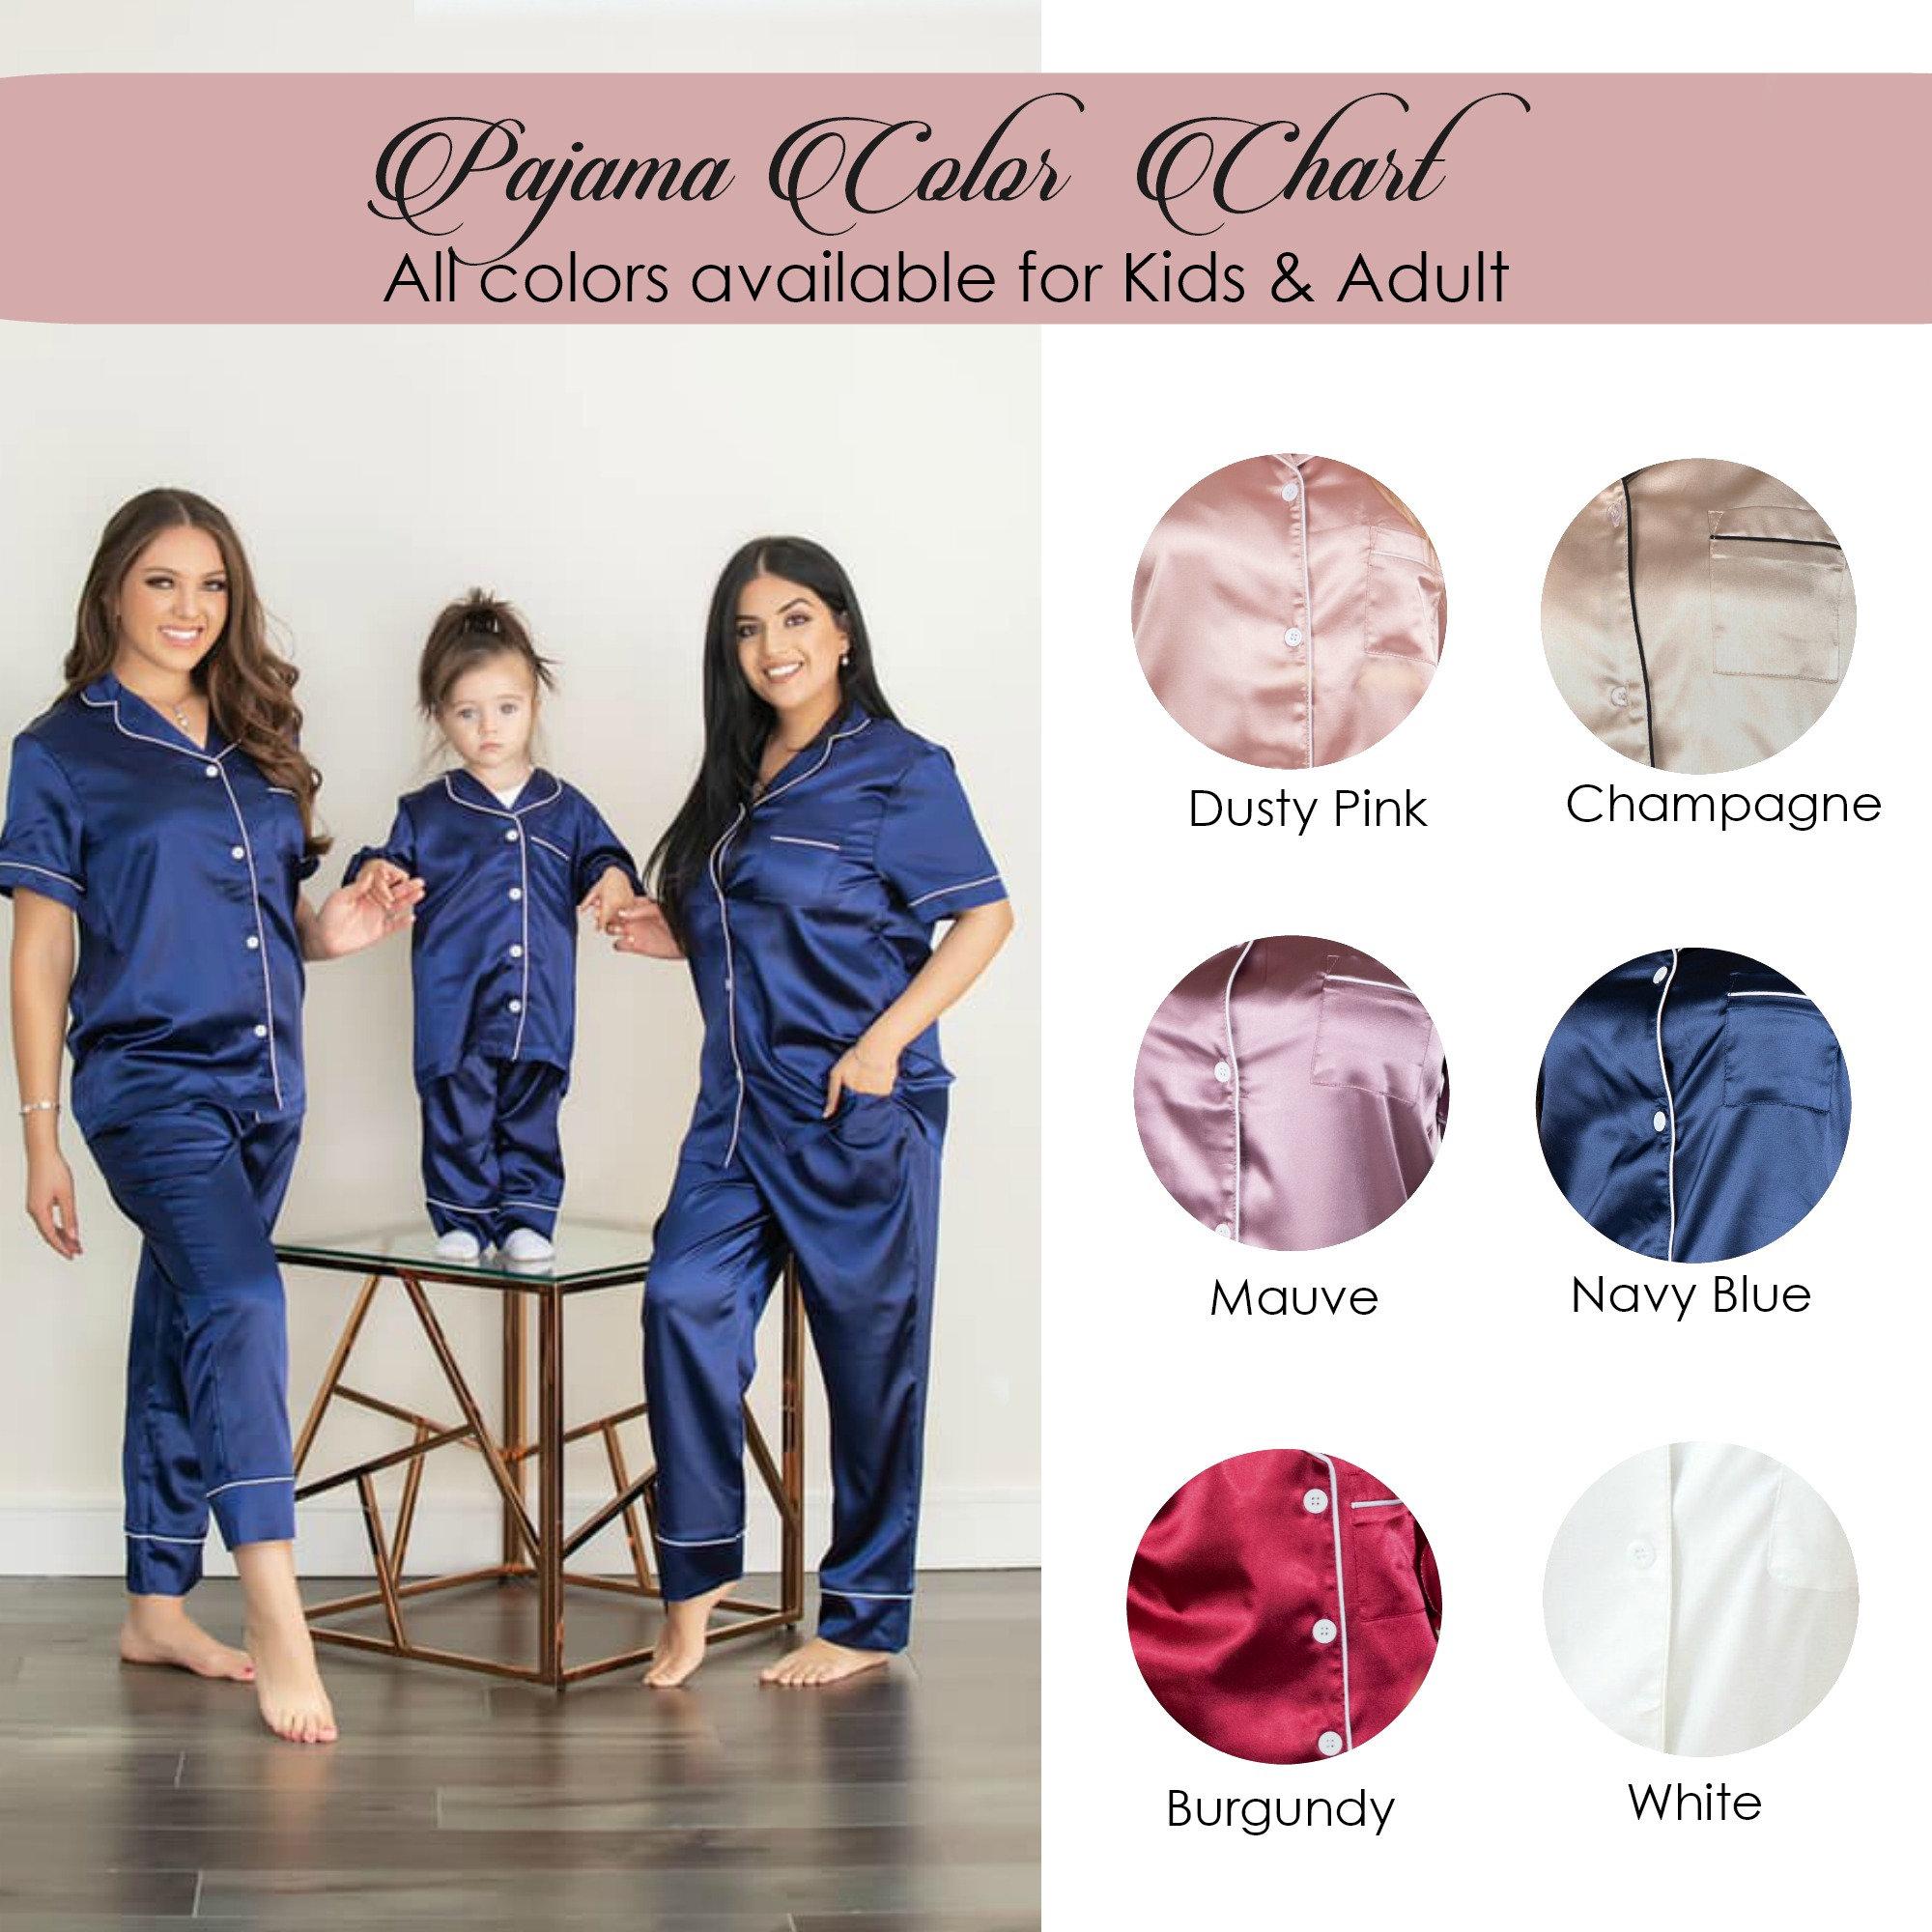 Matching pjsKIDS/ADULT Personalized Short Sleeve pants pajama image 8